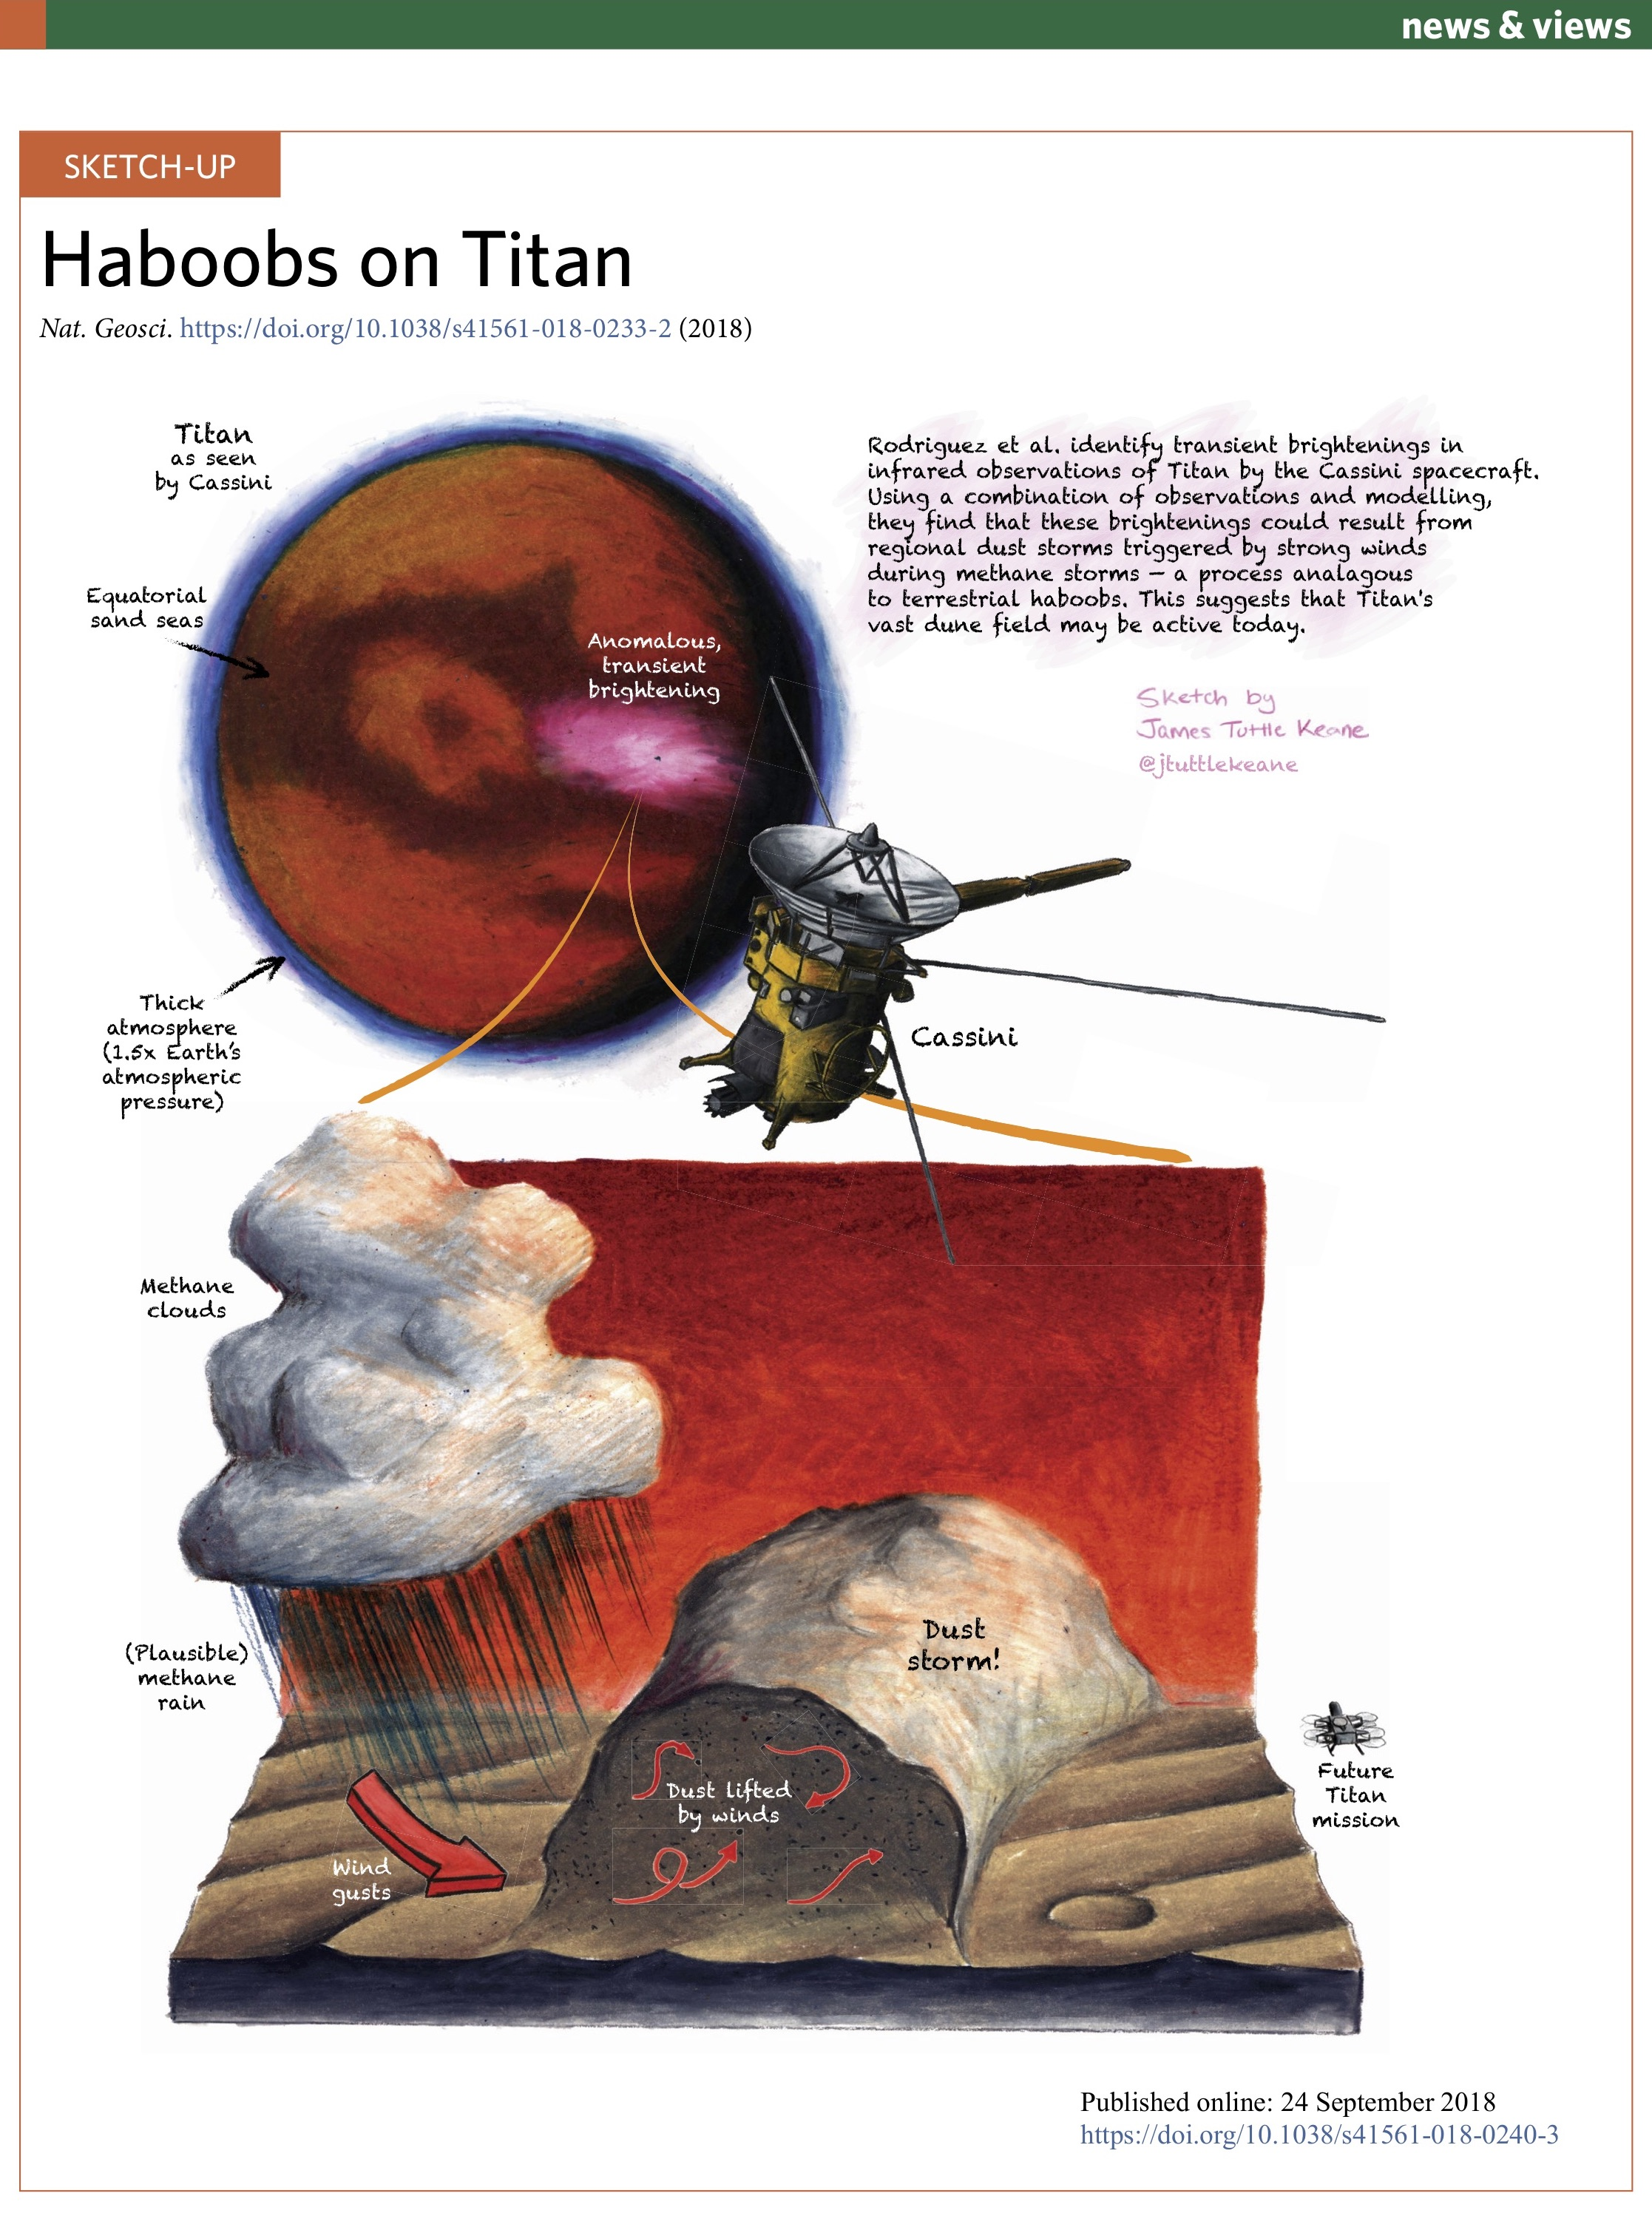 Haboobs on Titan